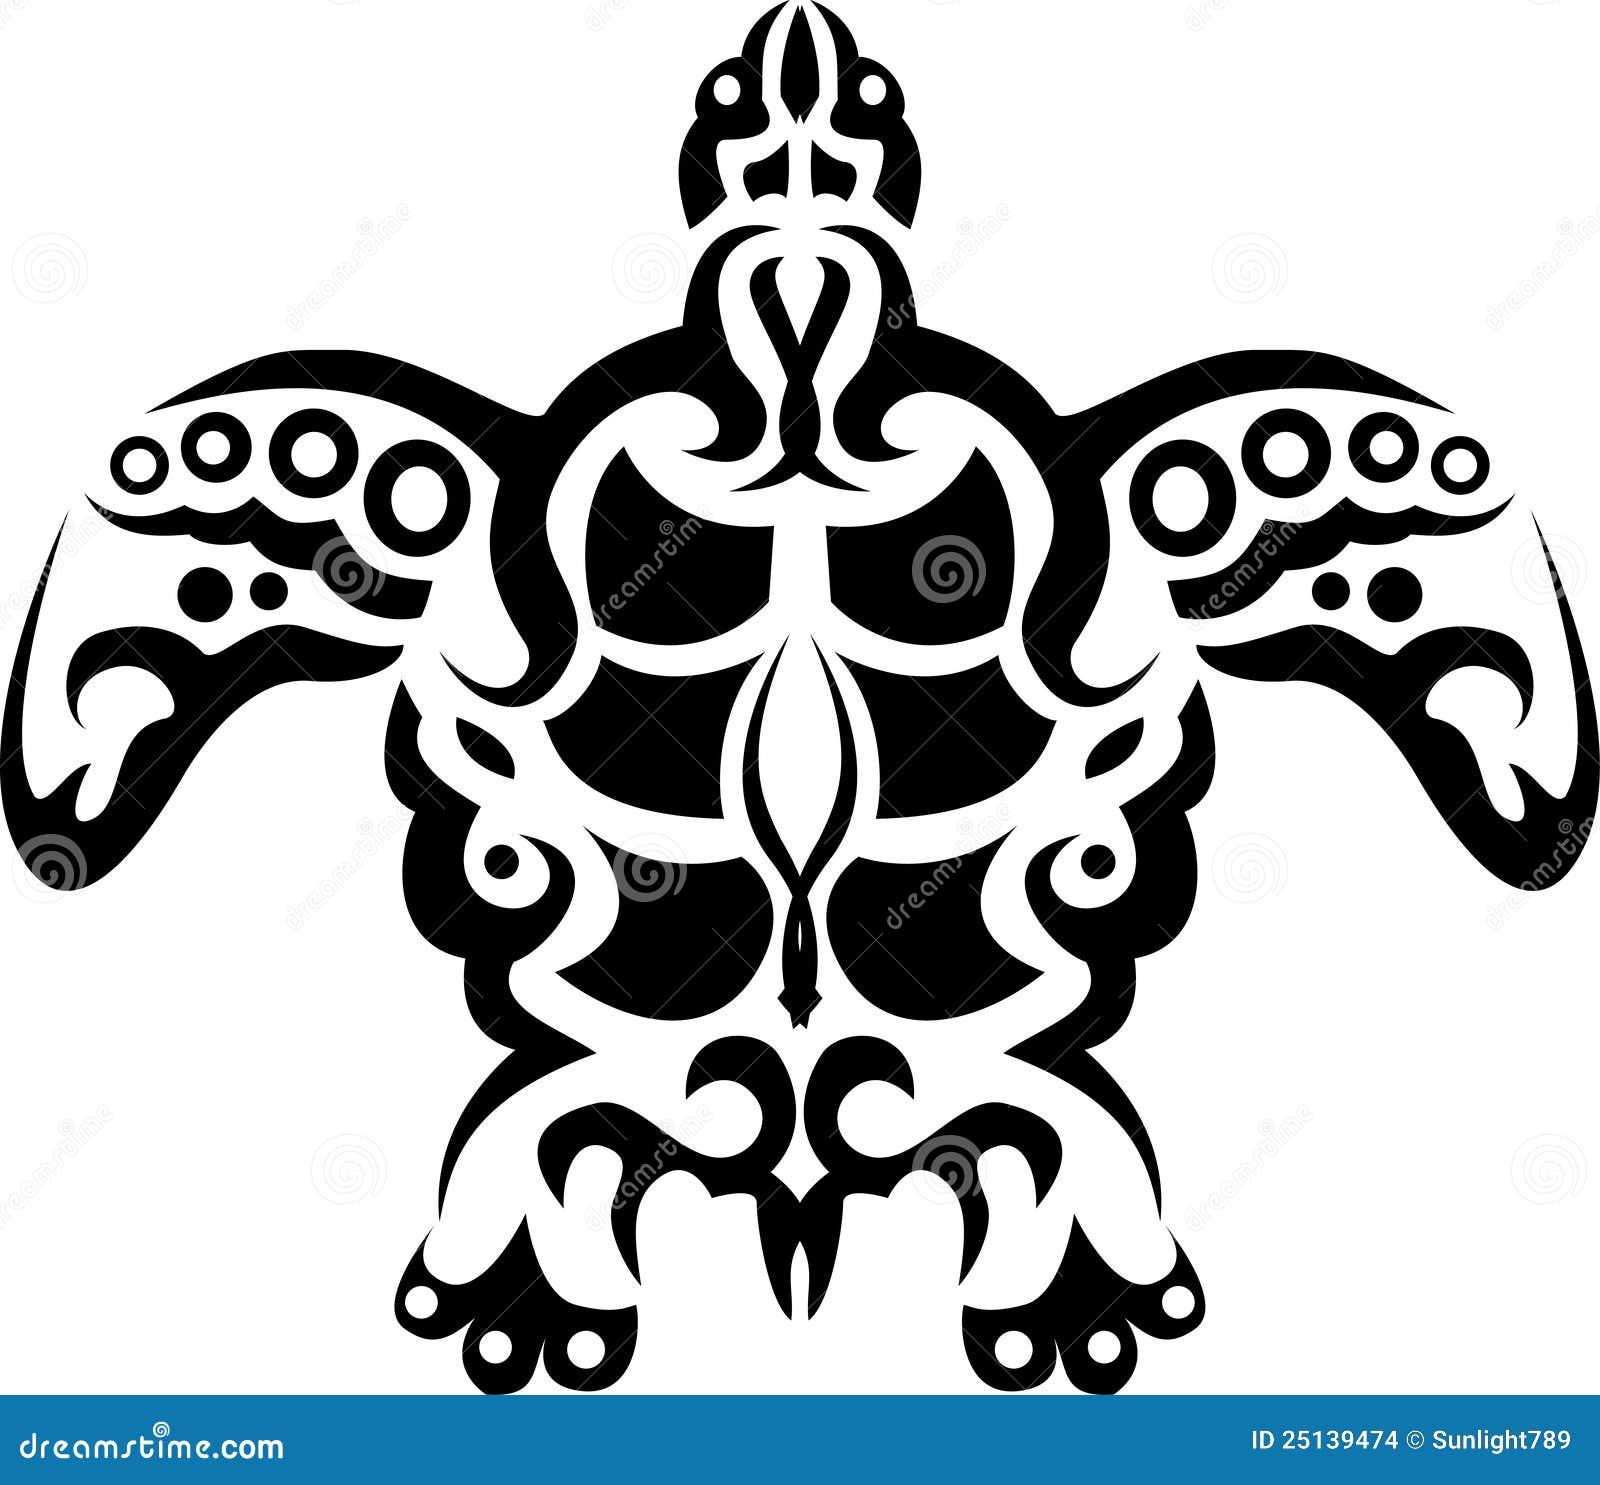 tatouage tribal de tortue images stock image 25139474. Black Bedroom Furniture Sets. Home Design Ideas